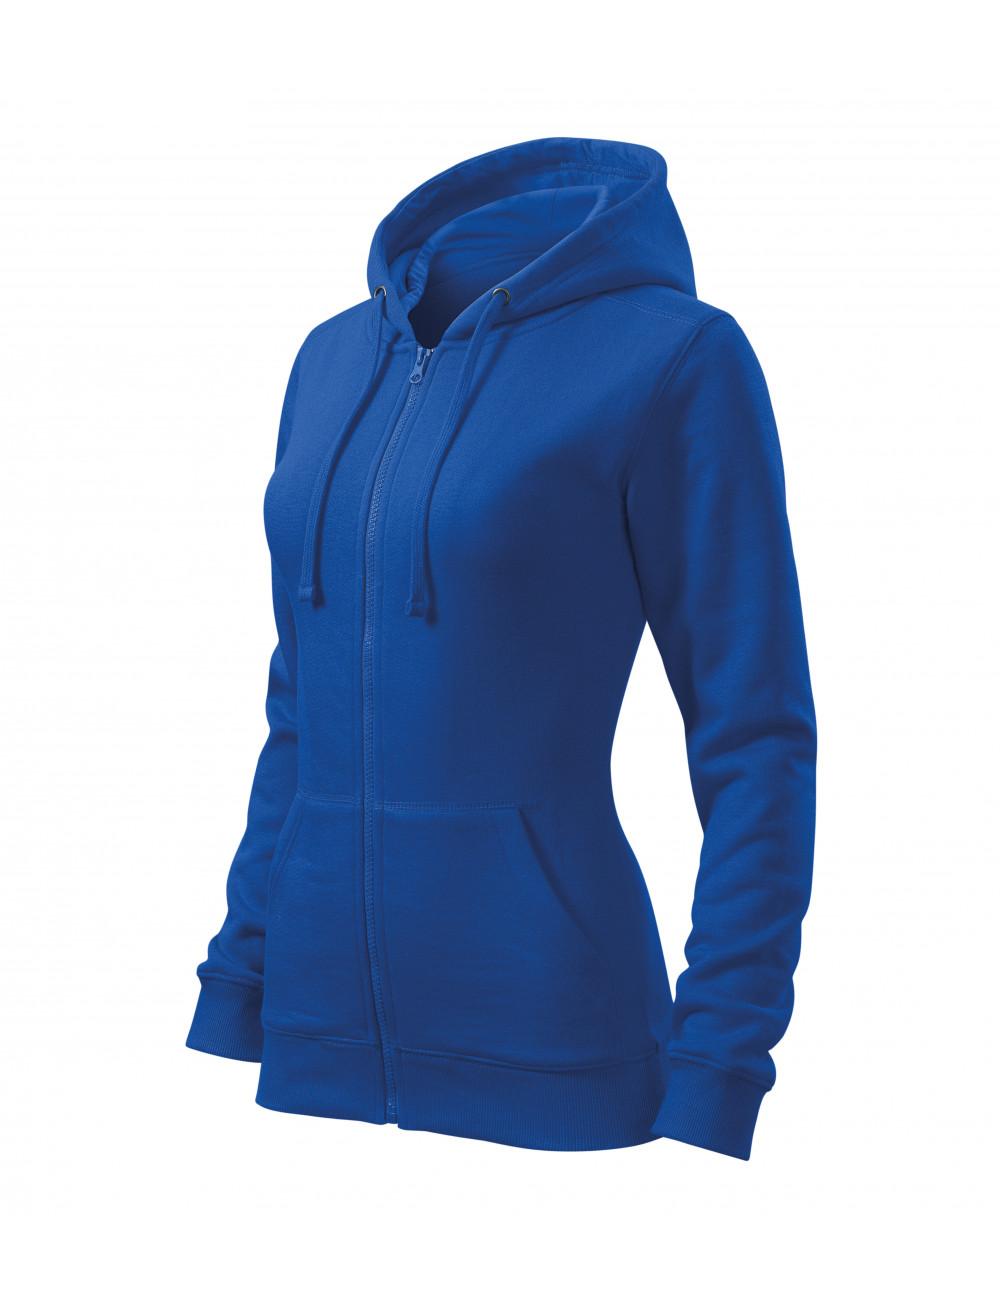 Adler MALFINI Bluza damska Trendy Zipper 411 chabrowy